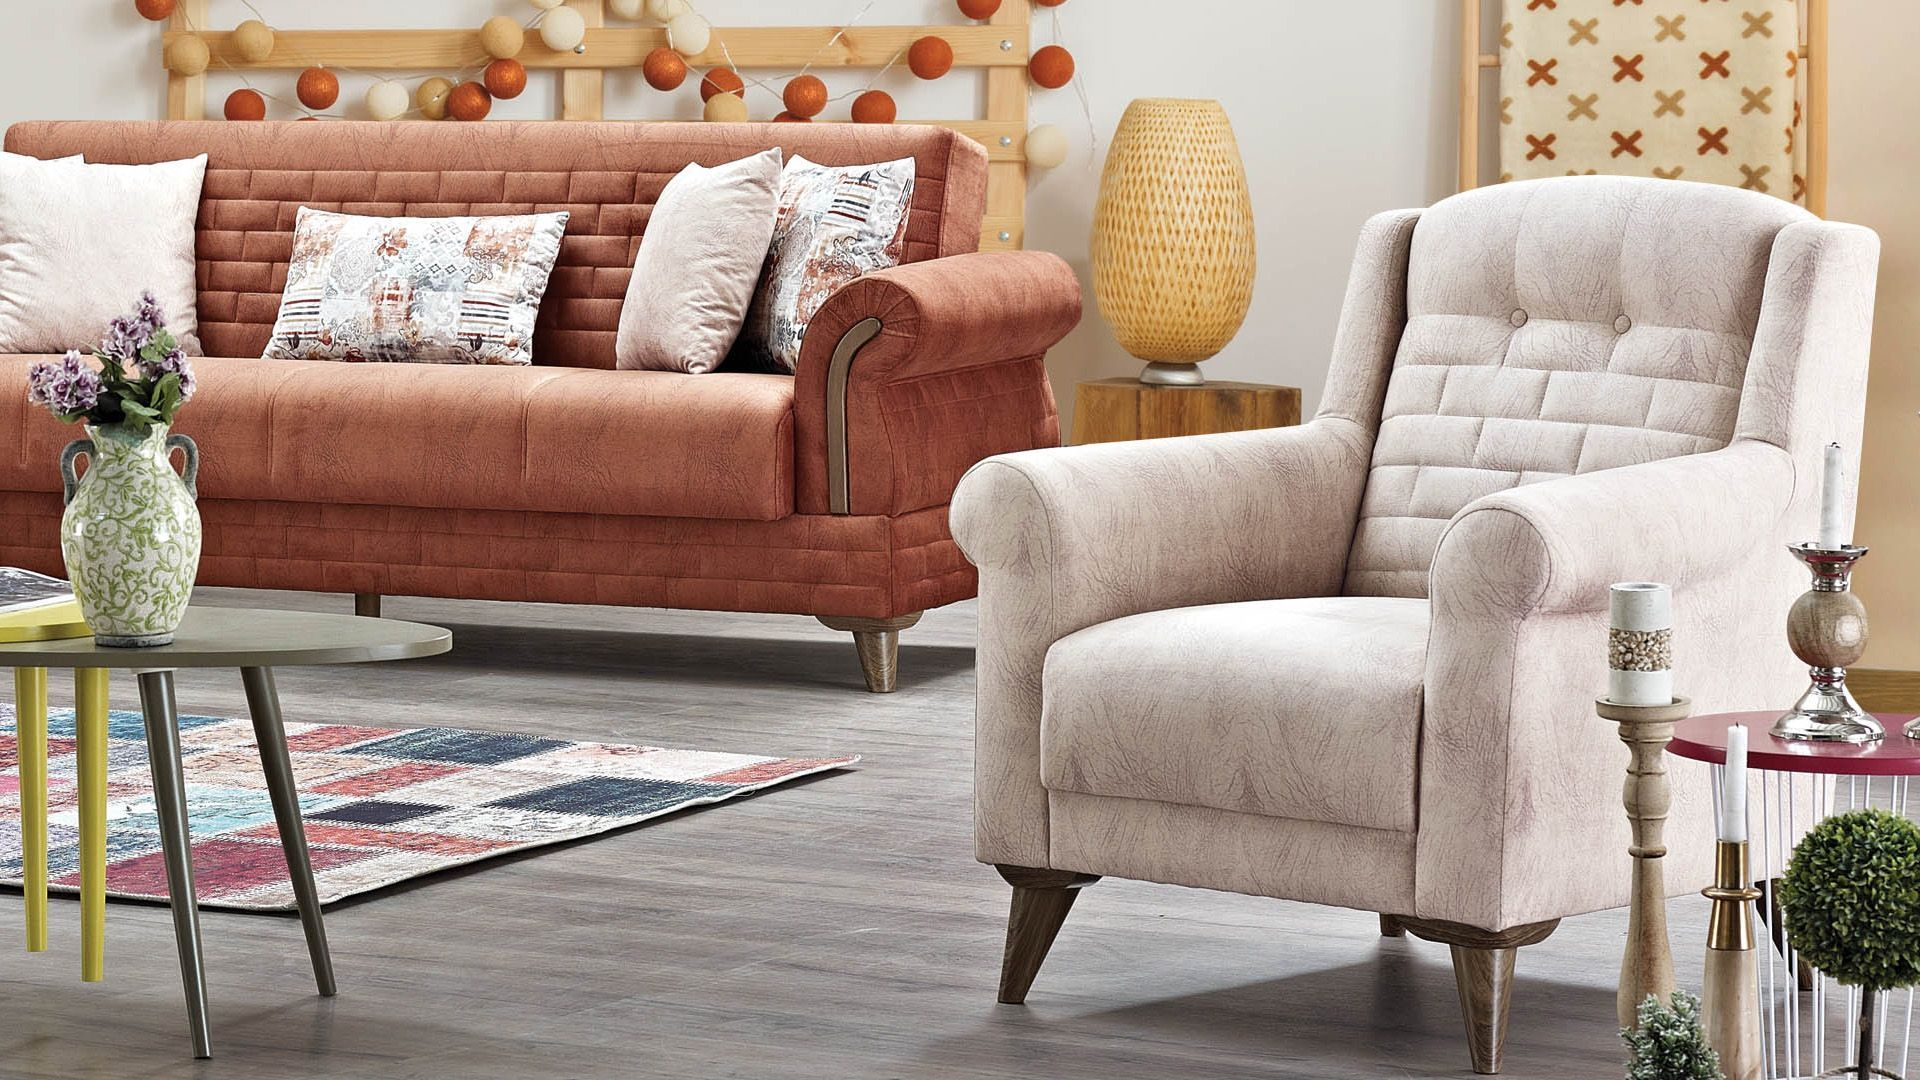 أسعد زهران للأثاث انتريه مودرن تركي Modern Living Room Home Decor Living Room